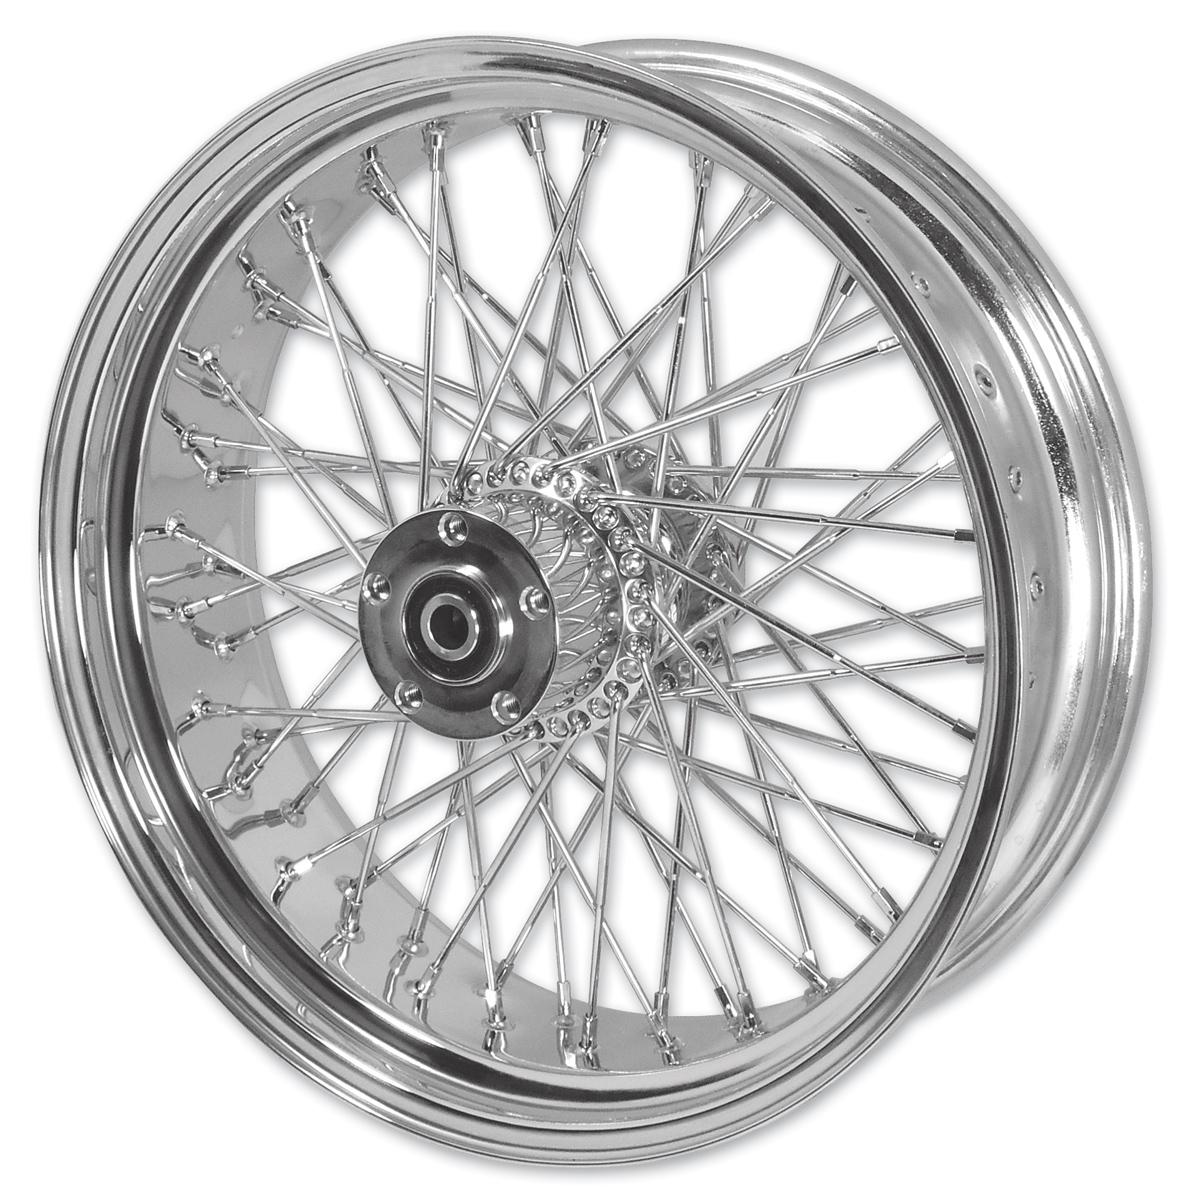 "Mid-USA Chrome Complete 40 Spoke Rear Wheel 16 X 3"""